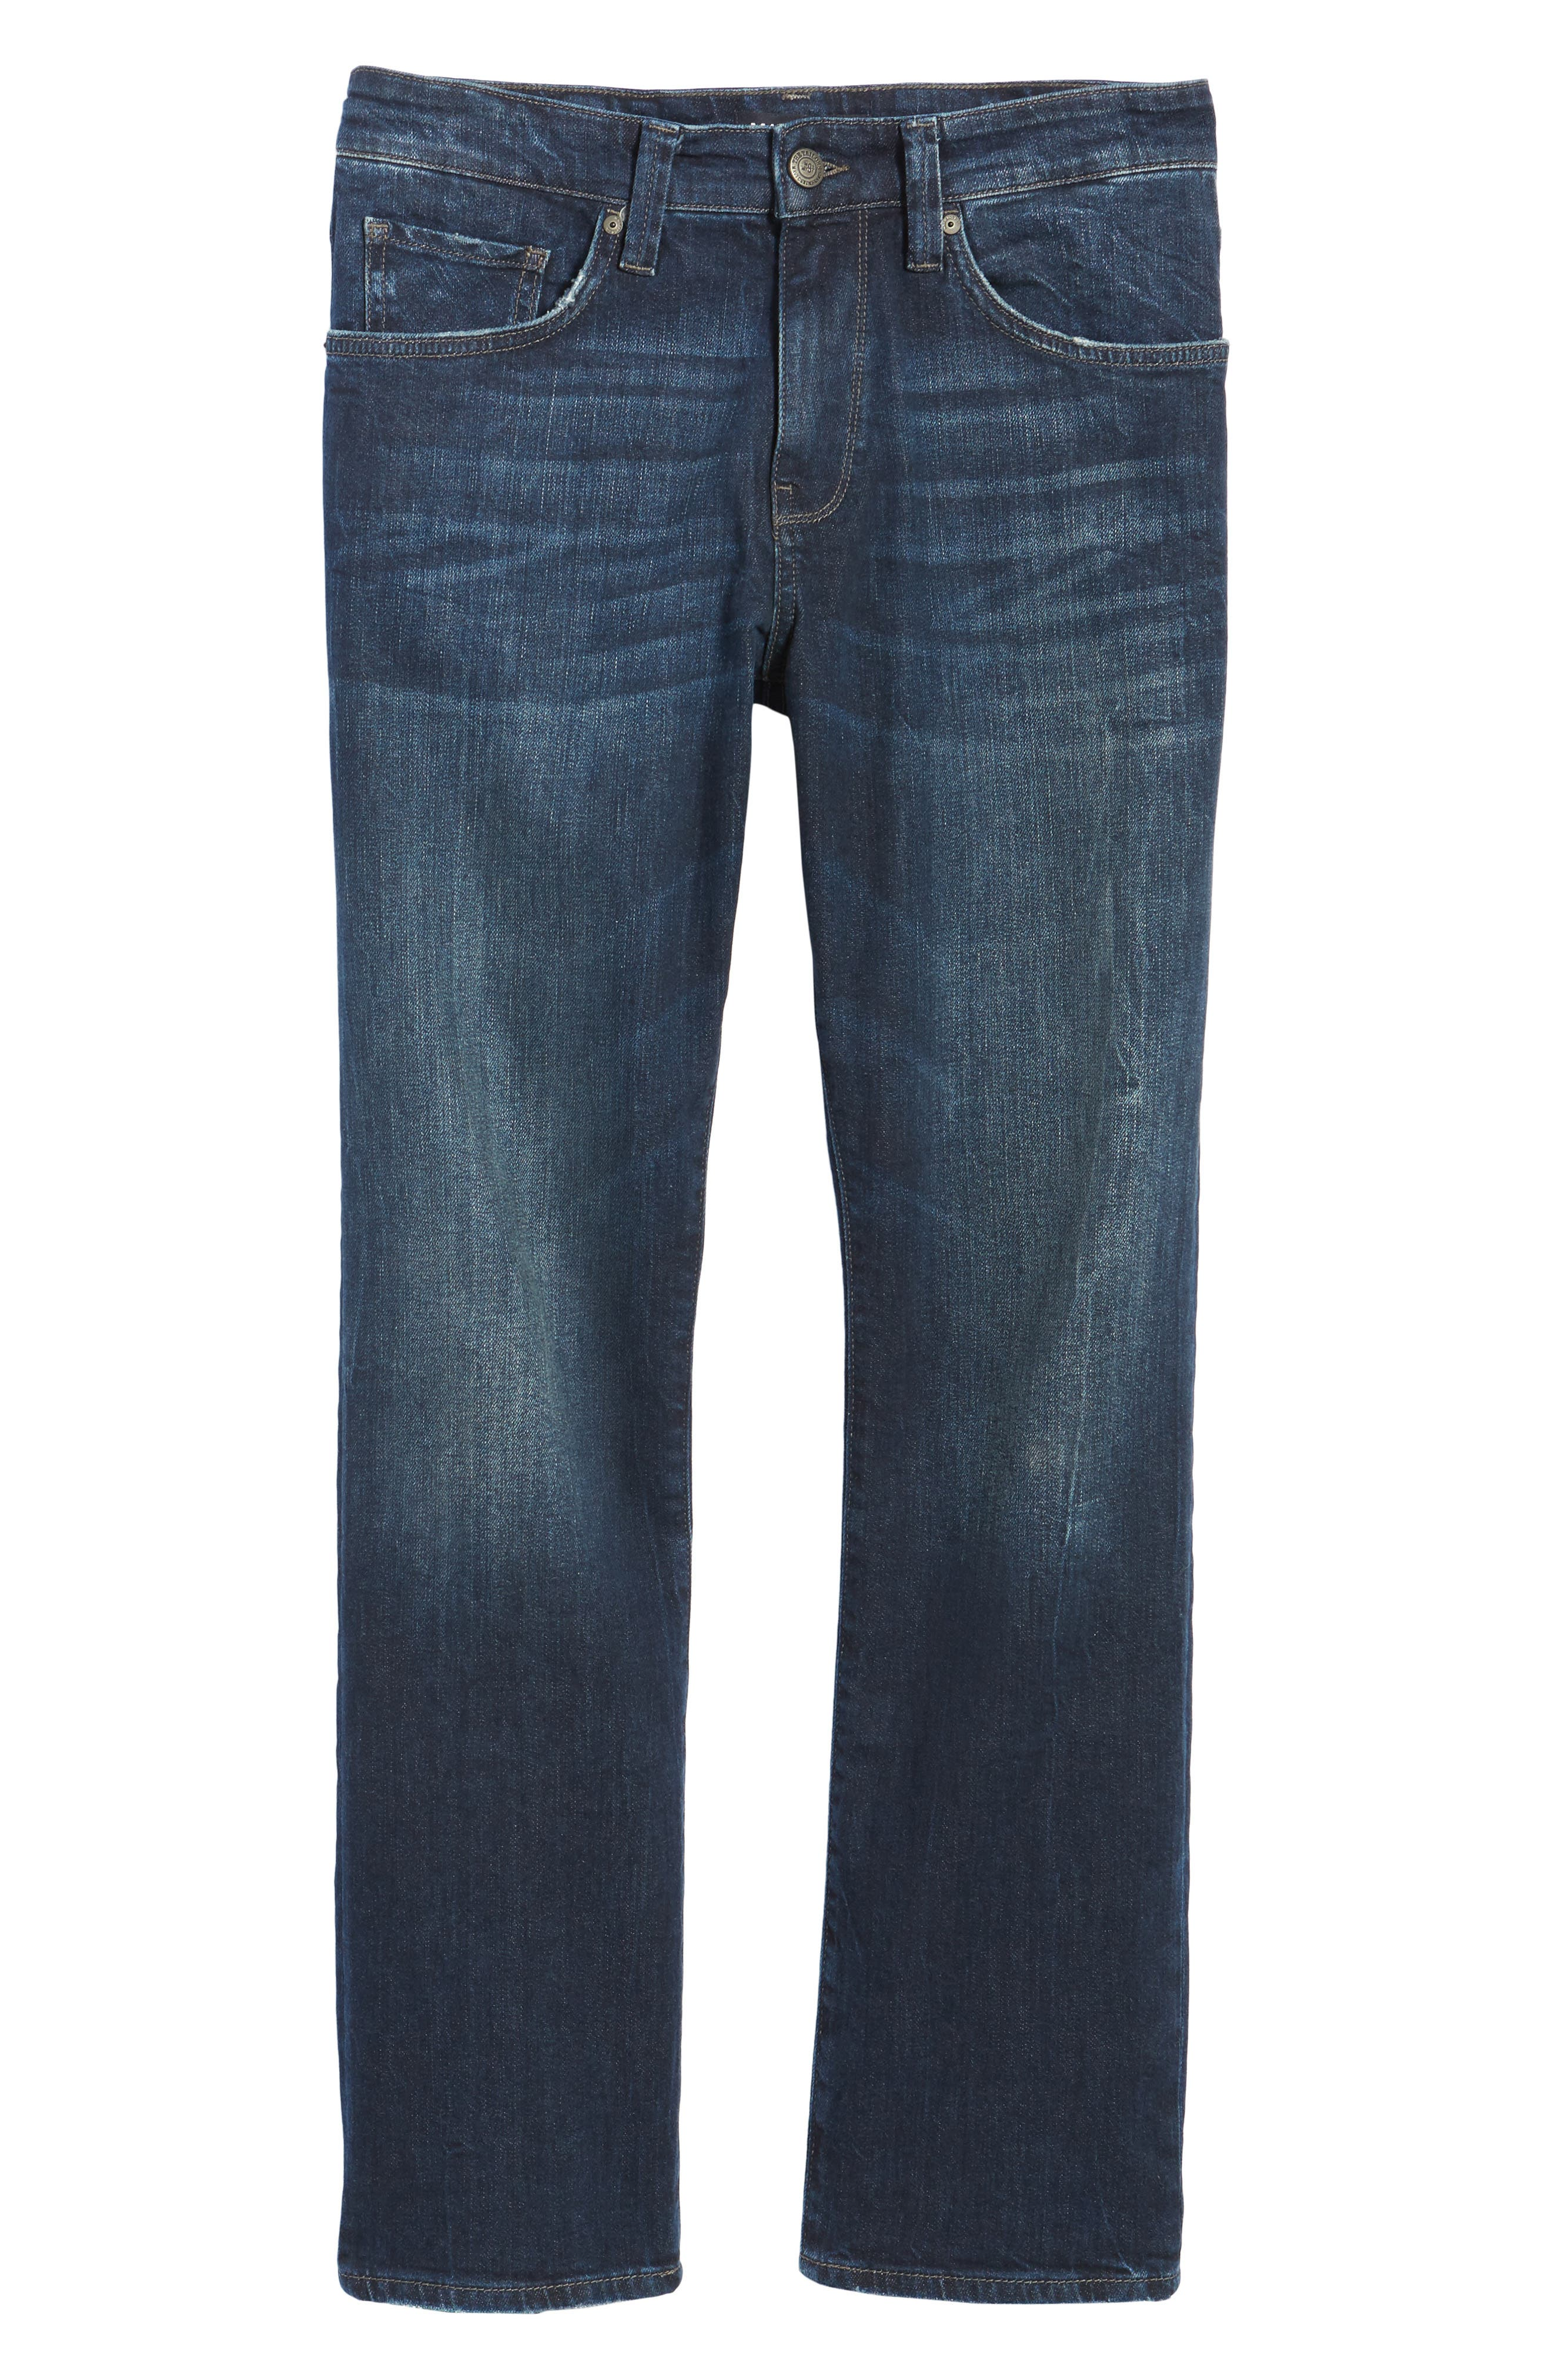 Myles Straight Leg Jeans,                             Alternate thumbnail 6, color,                             Deep Brooklyn